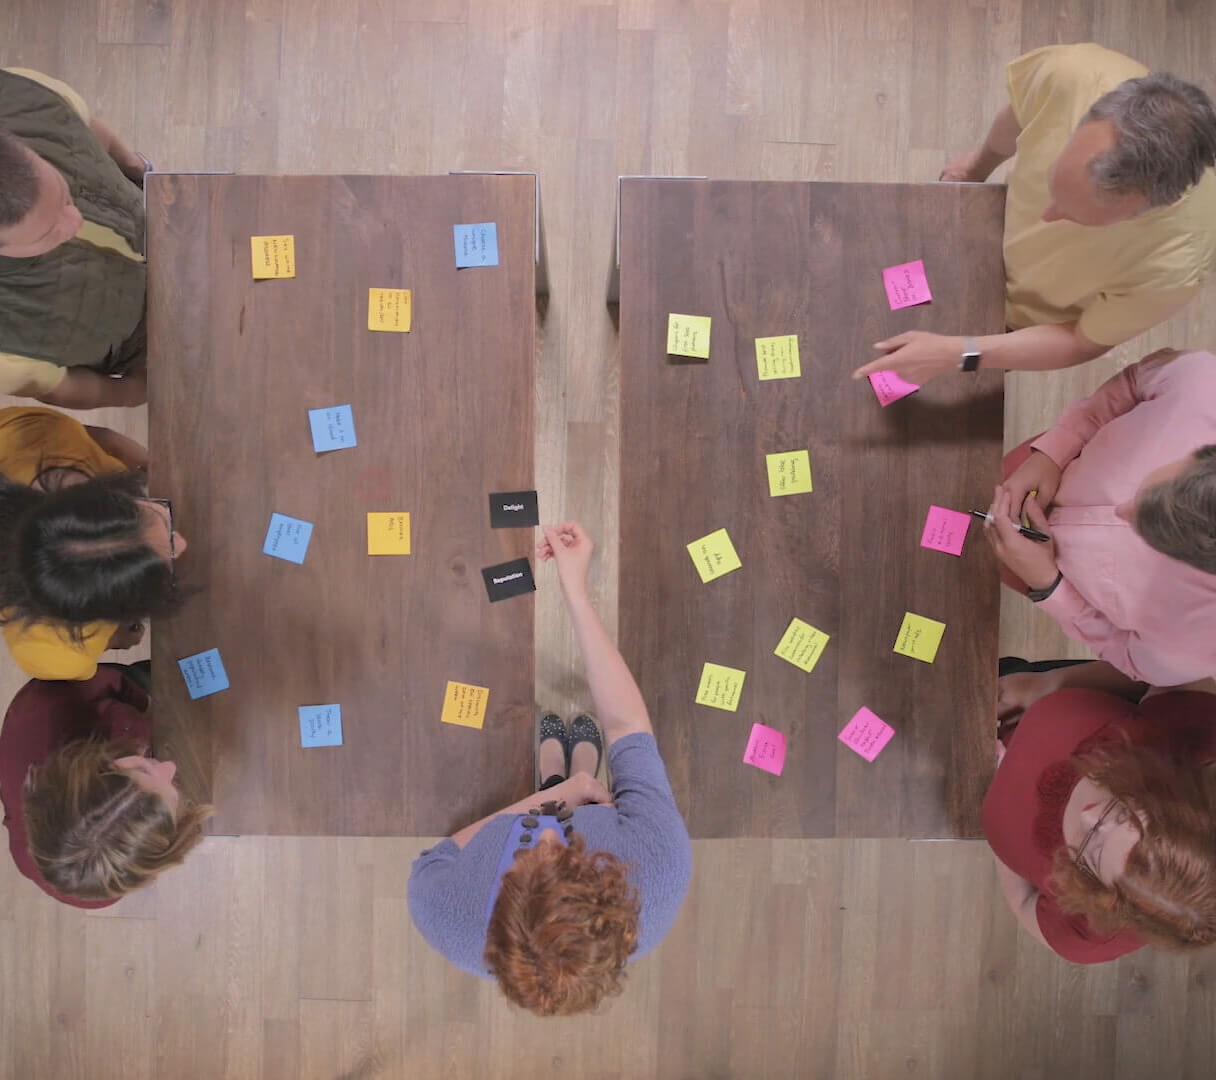 Advanced brainstorming technique